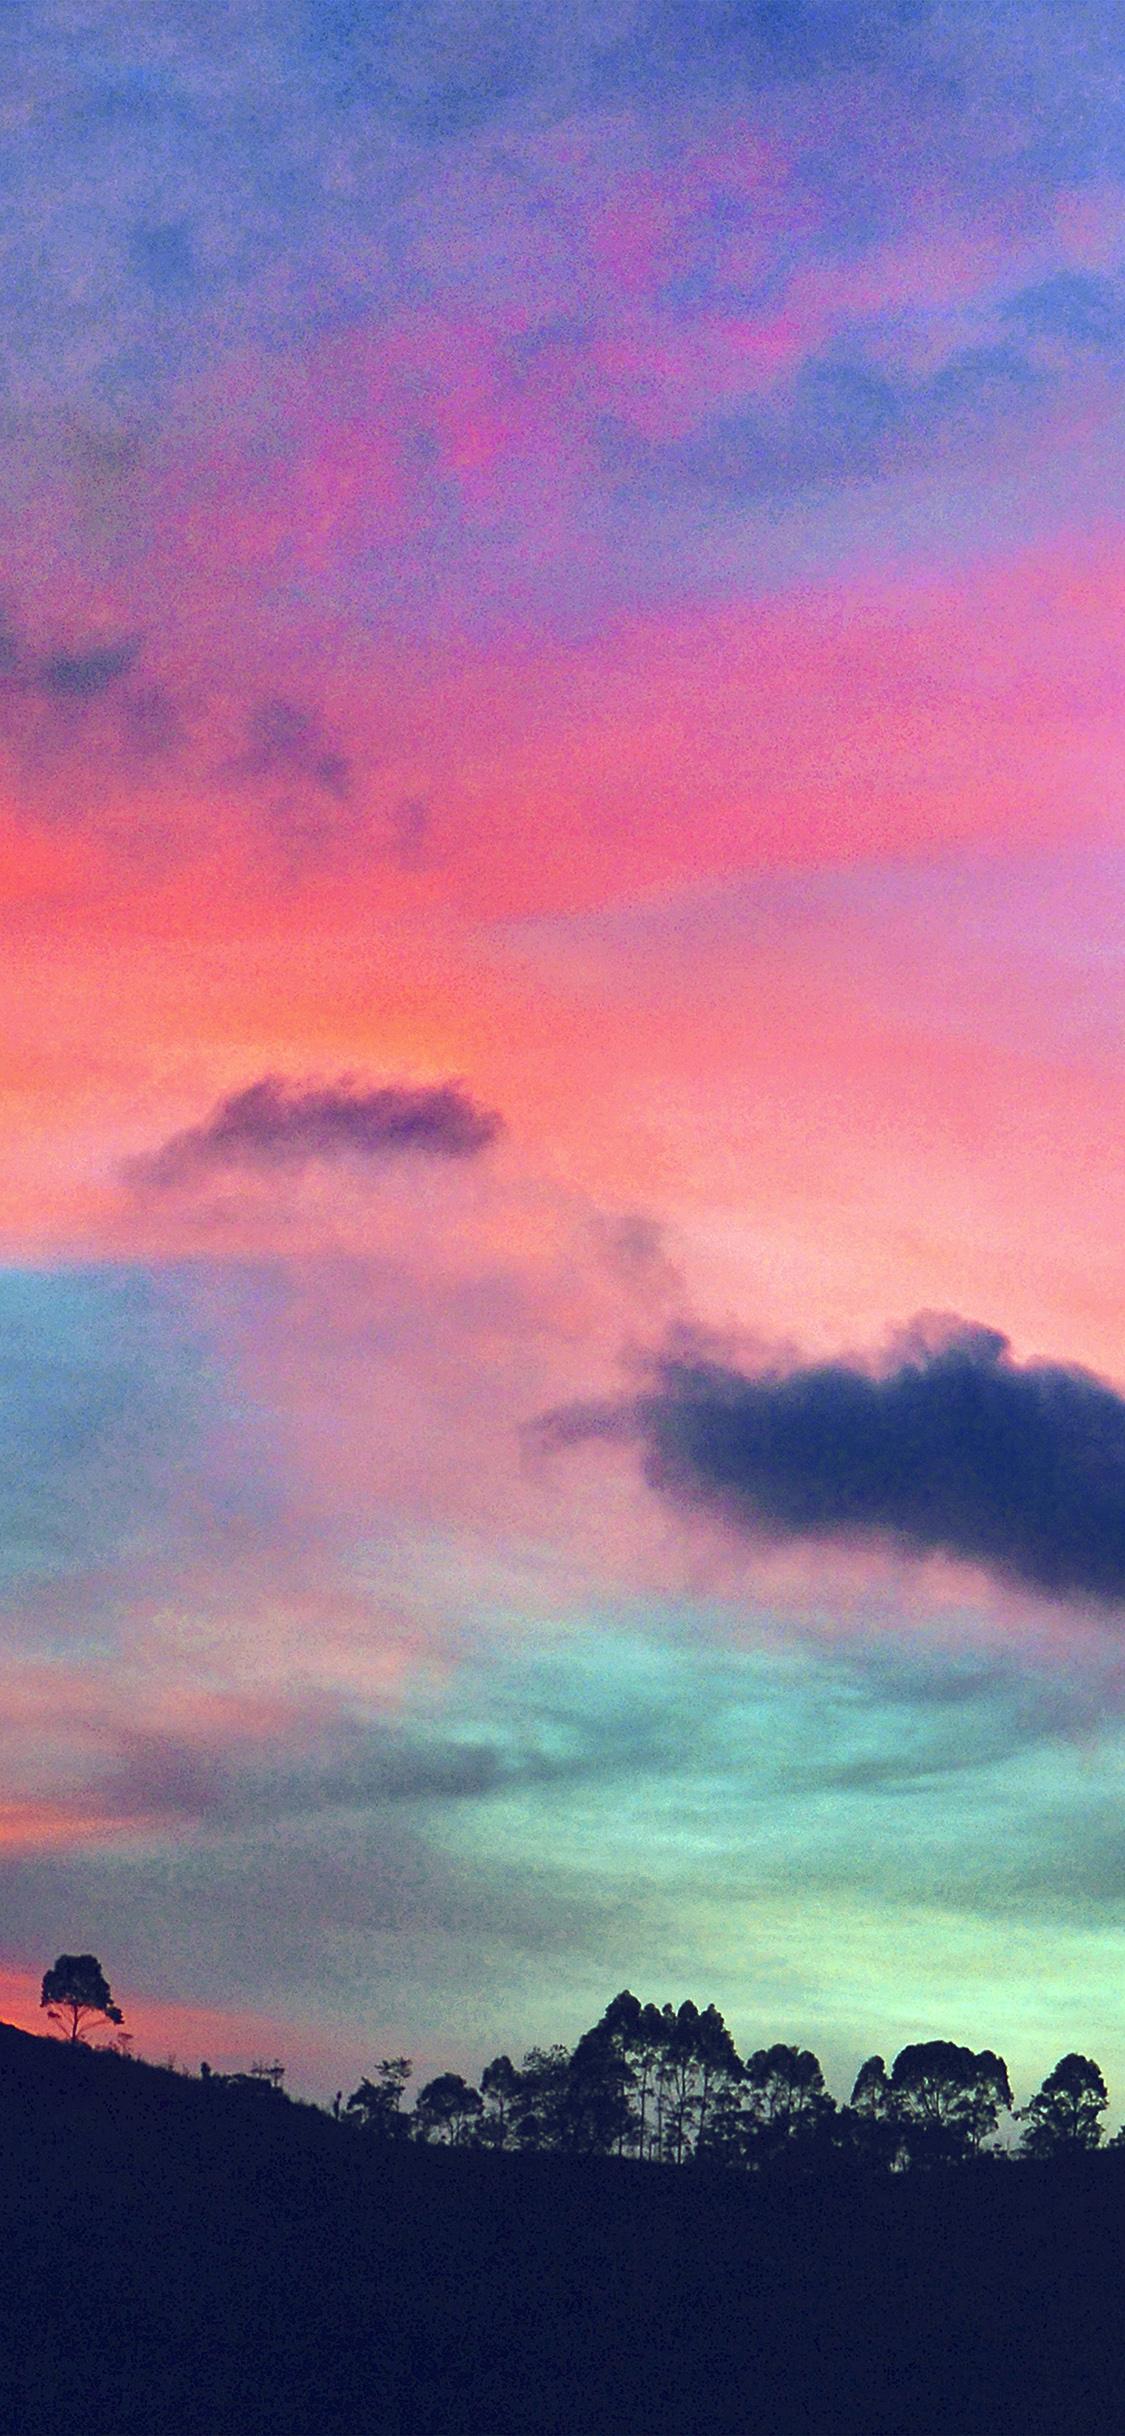 iPhonexpapers.com-Apple-iPhone-wallpaper-ng96-sky-rainbow-cloud-sunset-nature-blue-pink